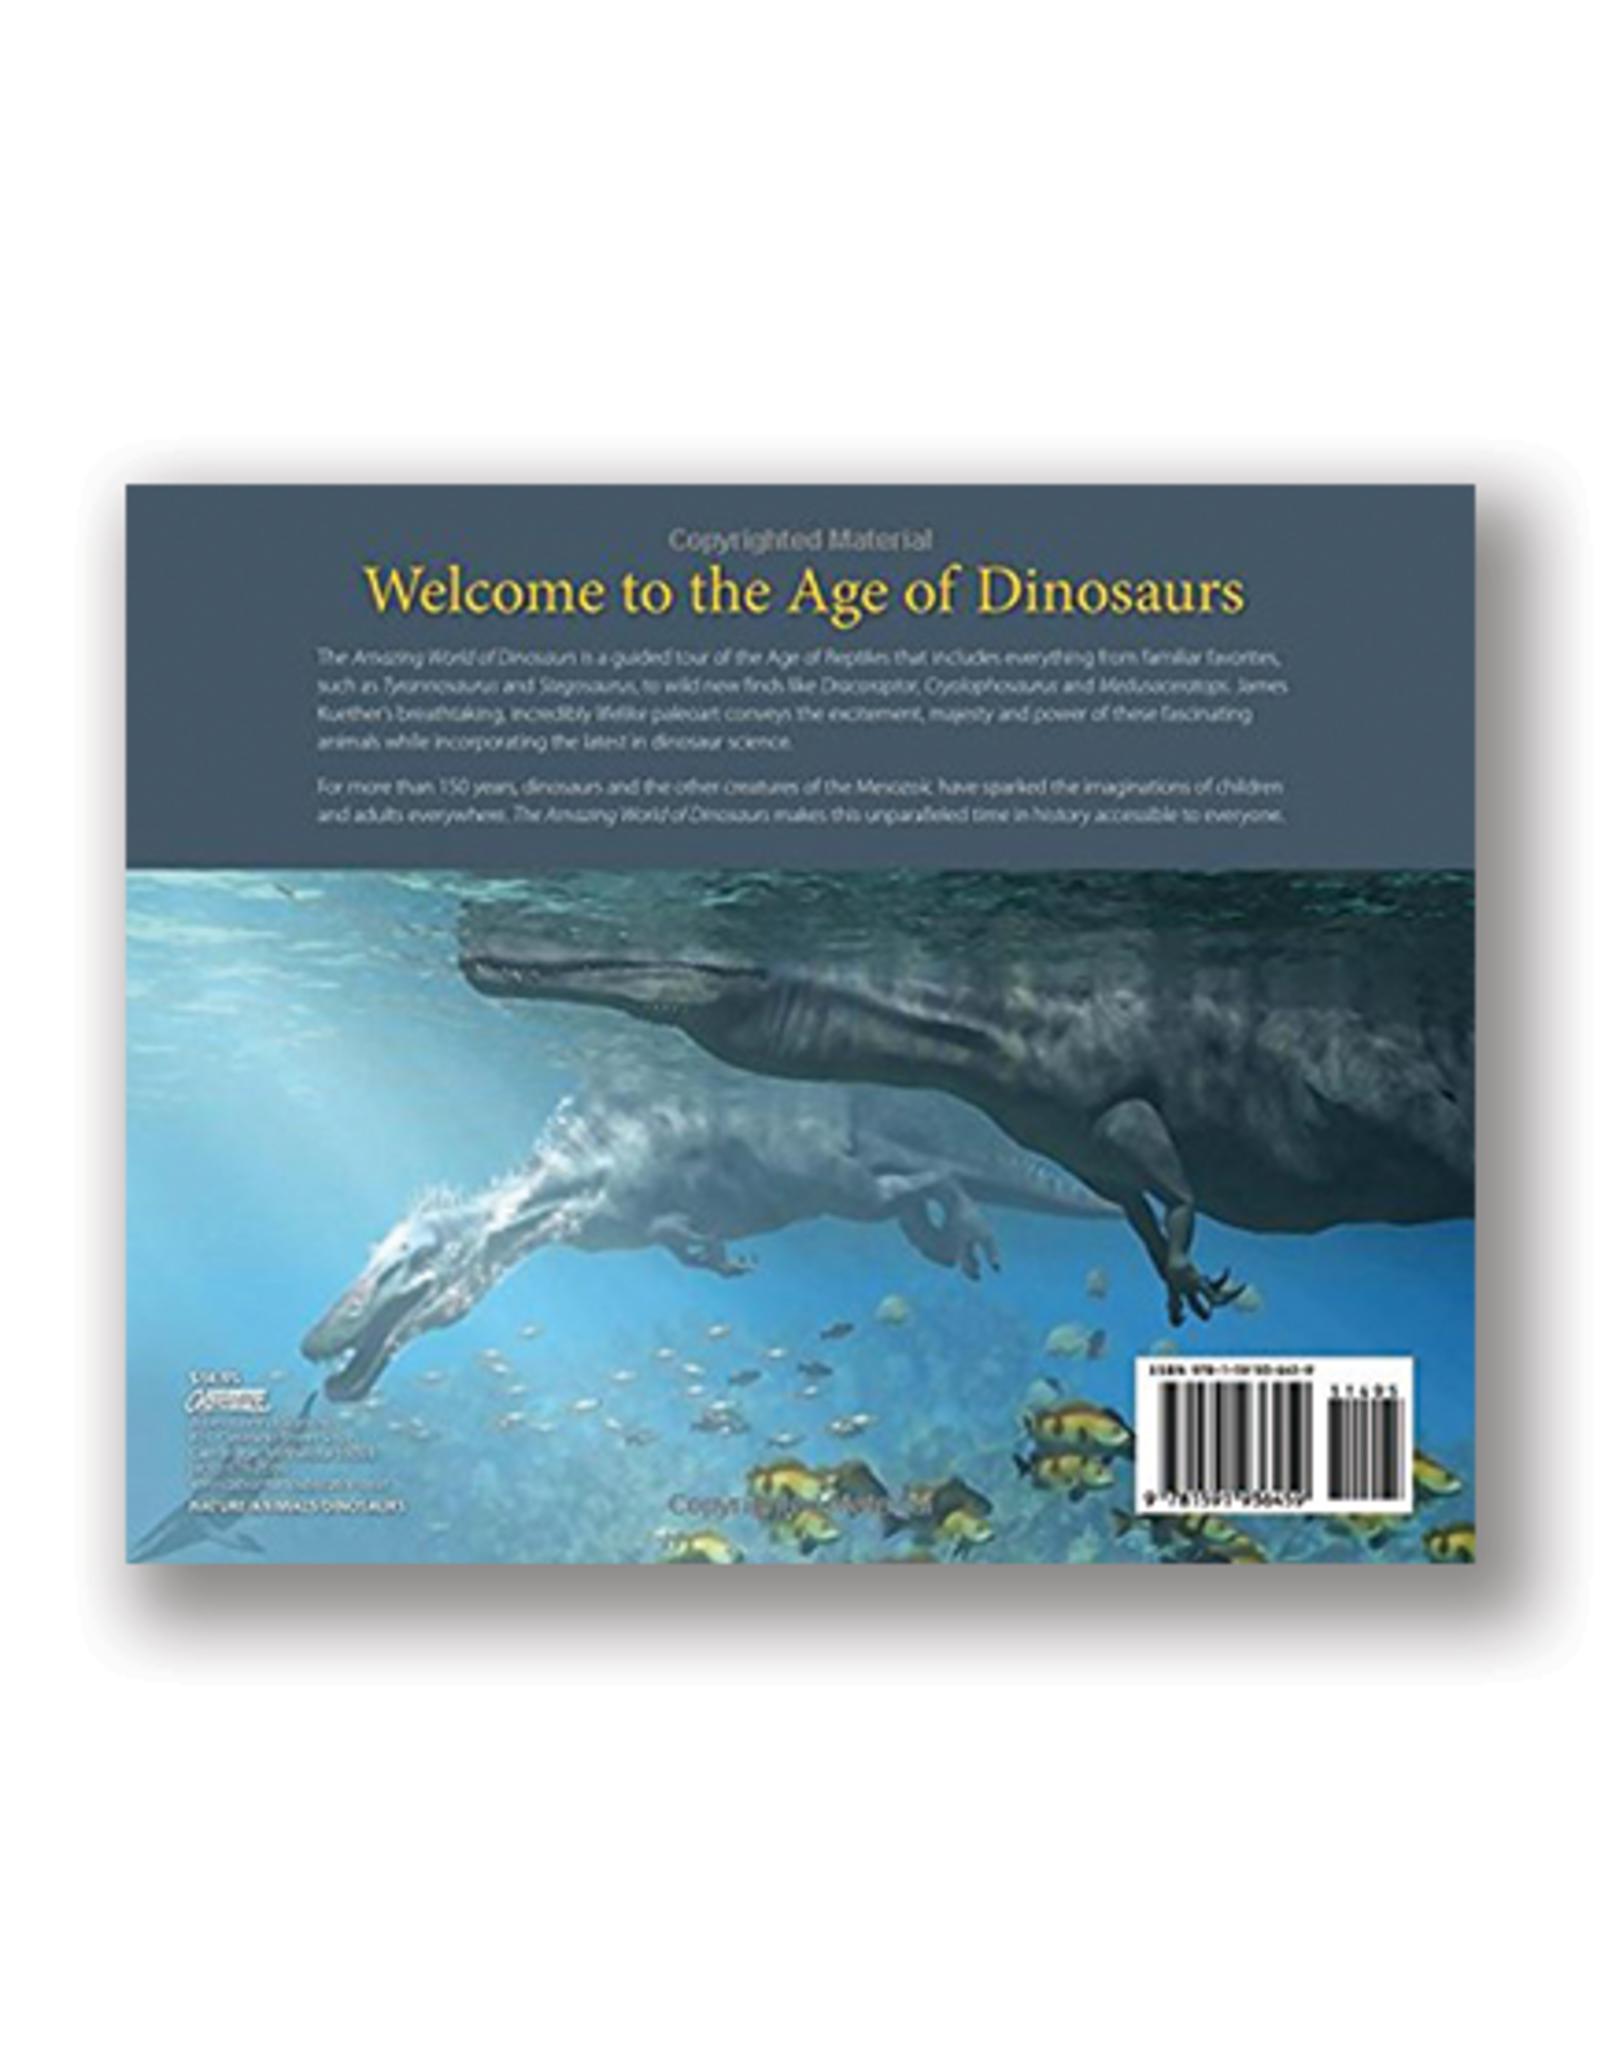 The Amazing World of Dinosaurs: An Illustrated Journey Through the Mesozoic Era